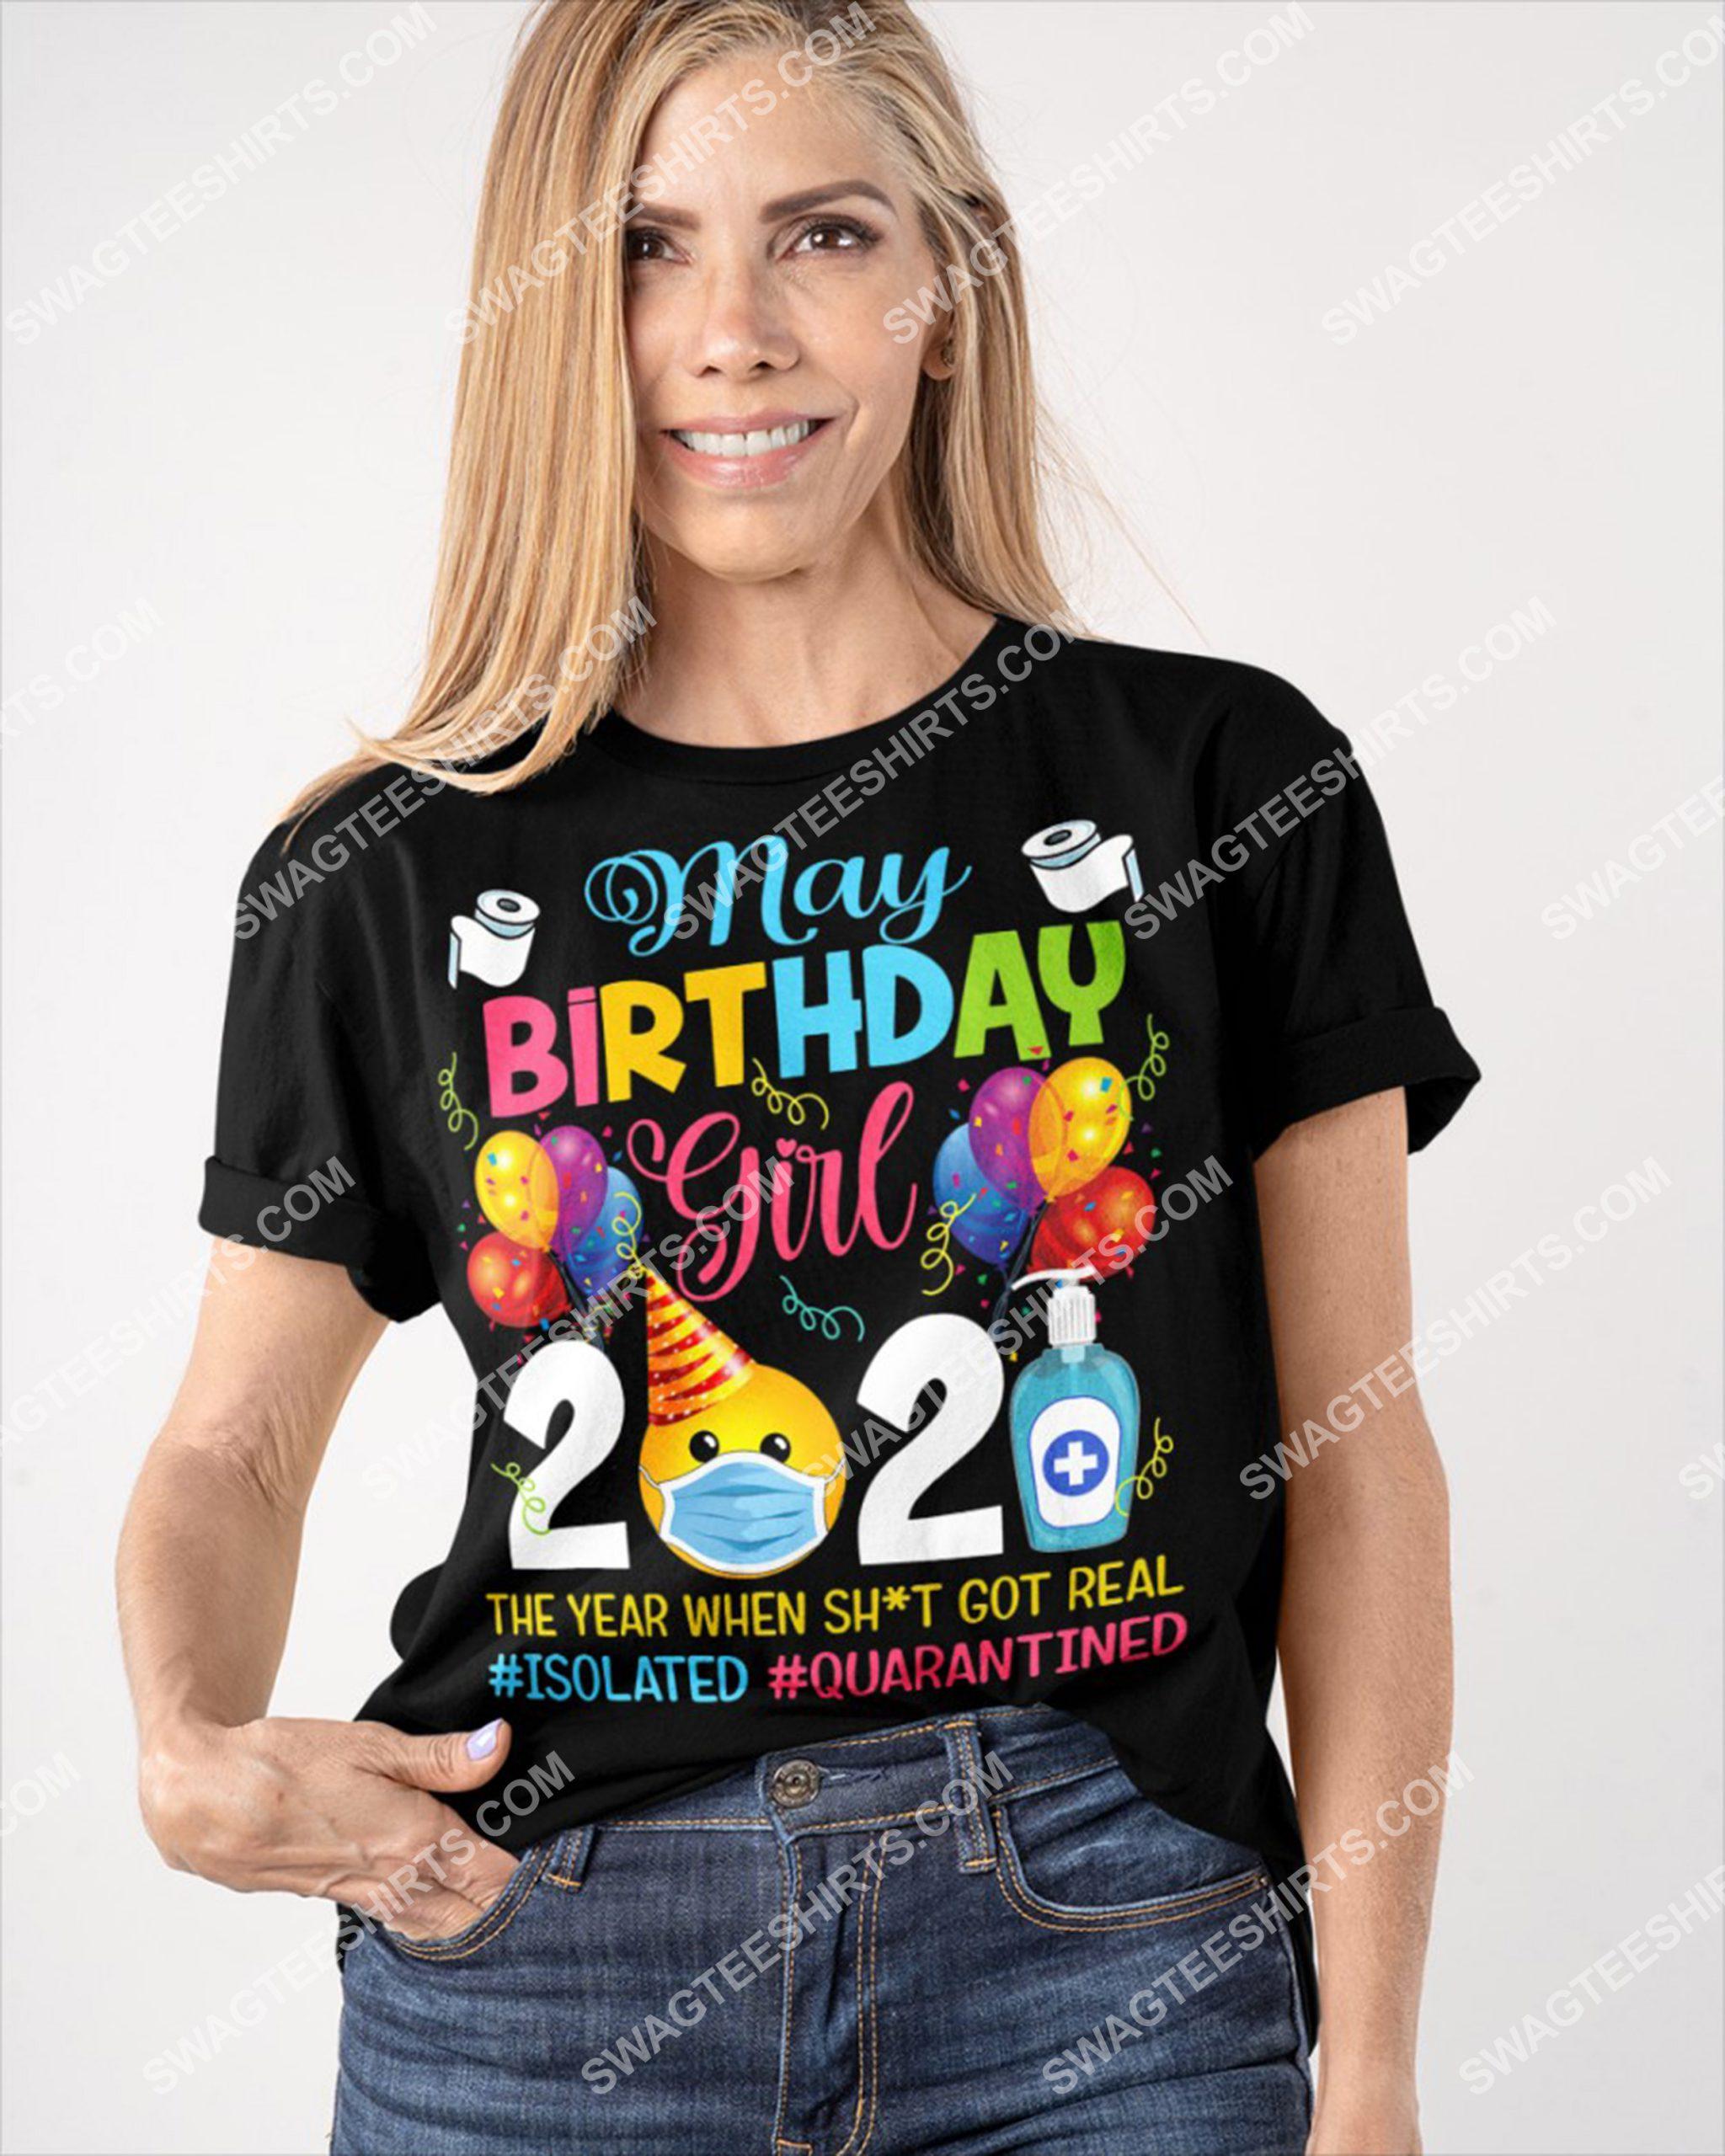 may birthday girl 2021 the year when shit got real quarantine shirt 2(1)